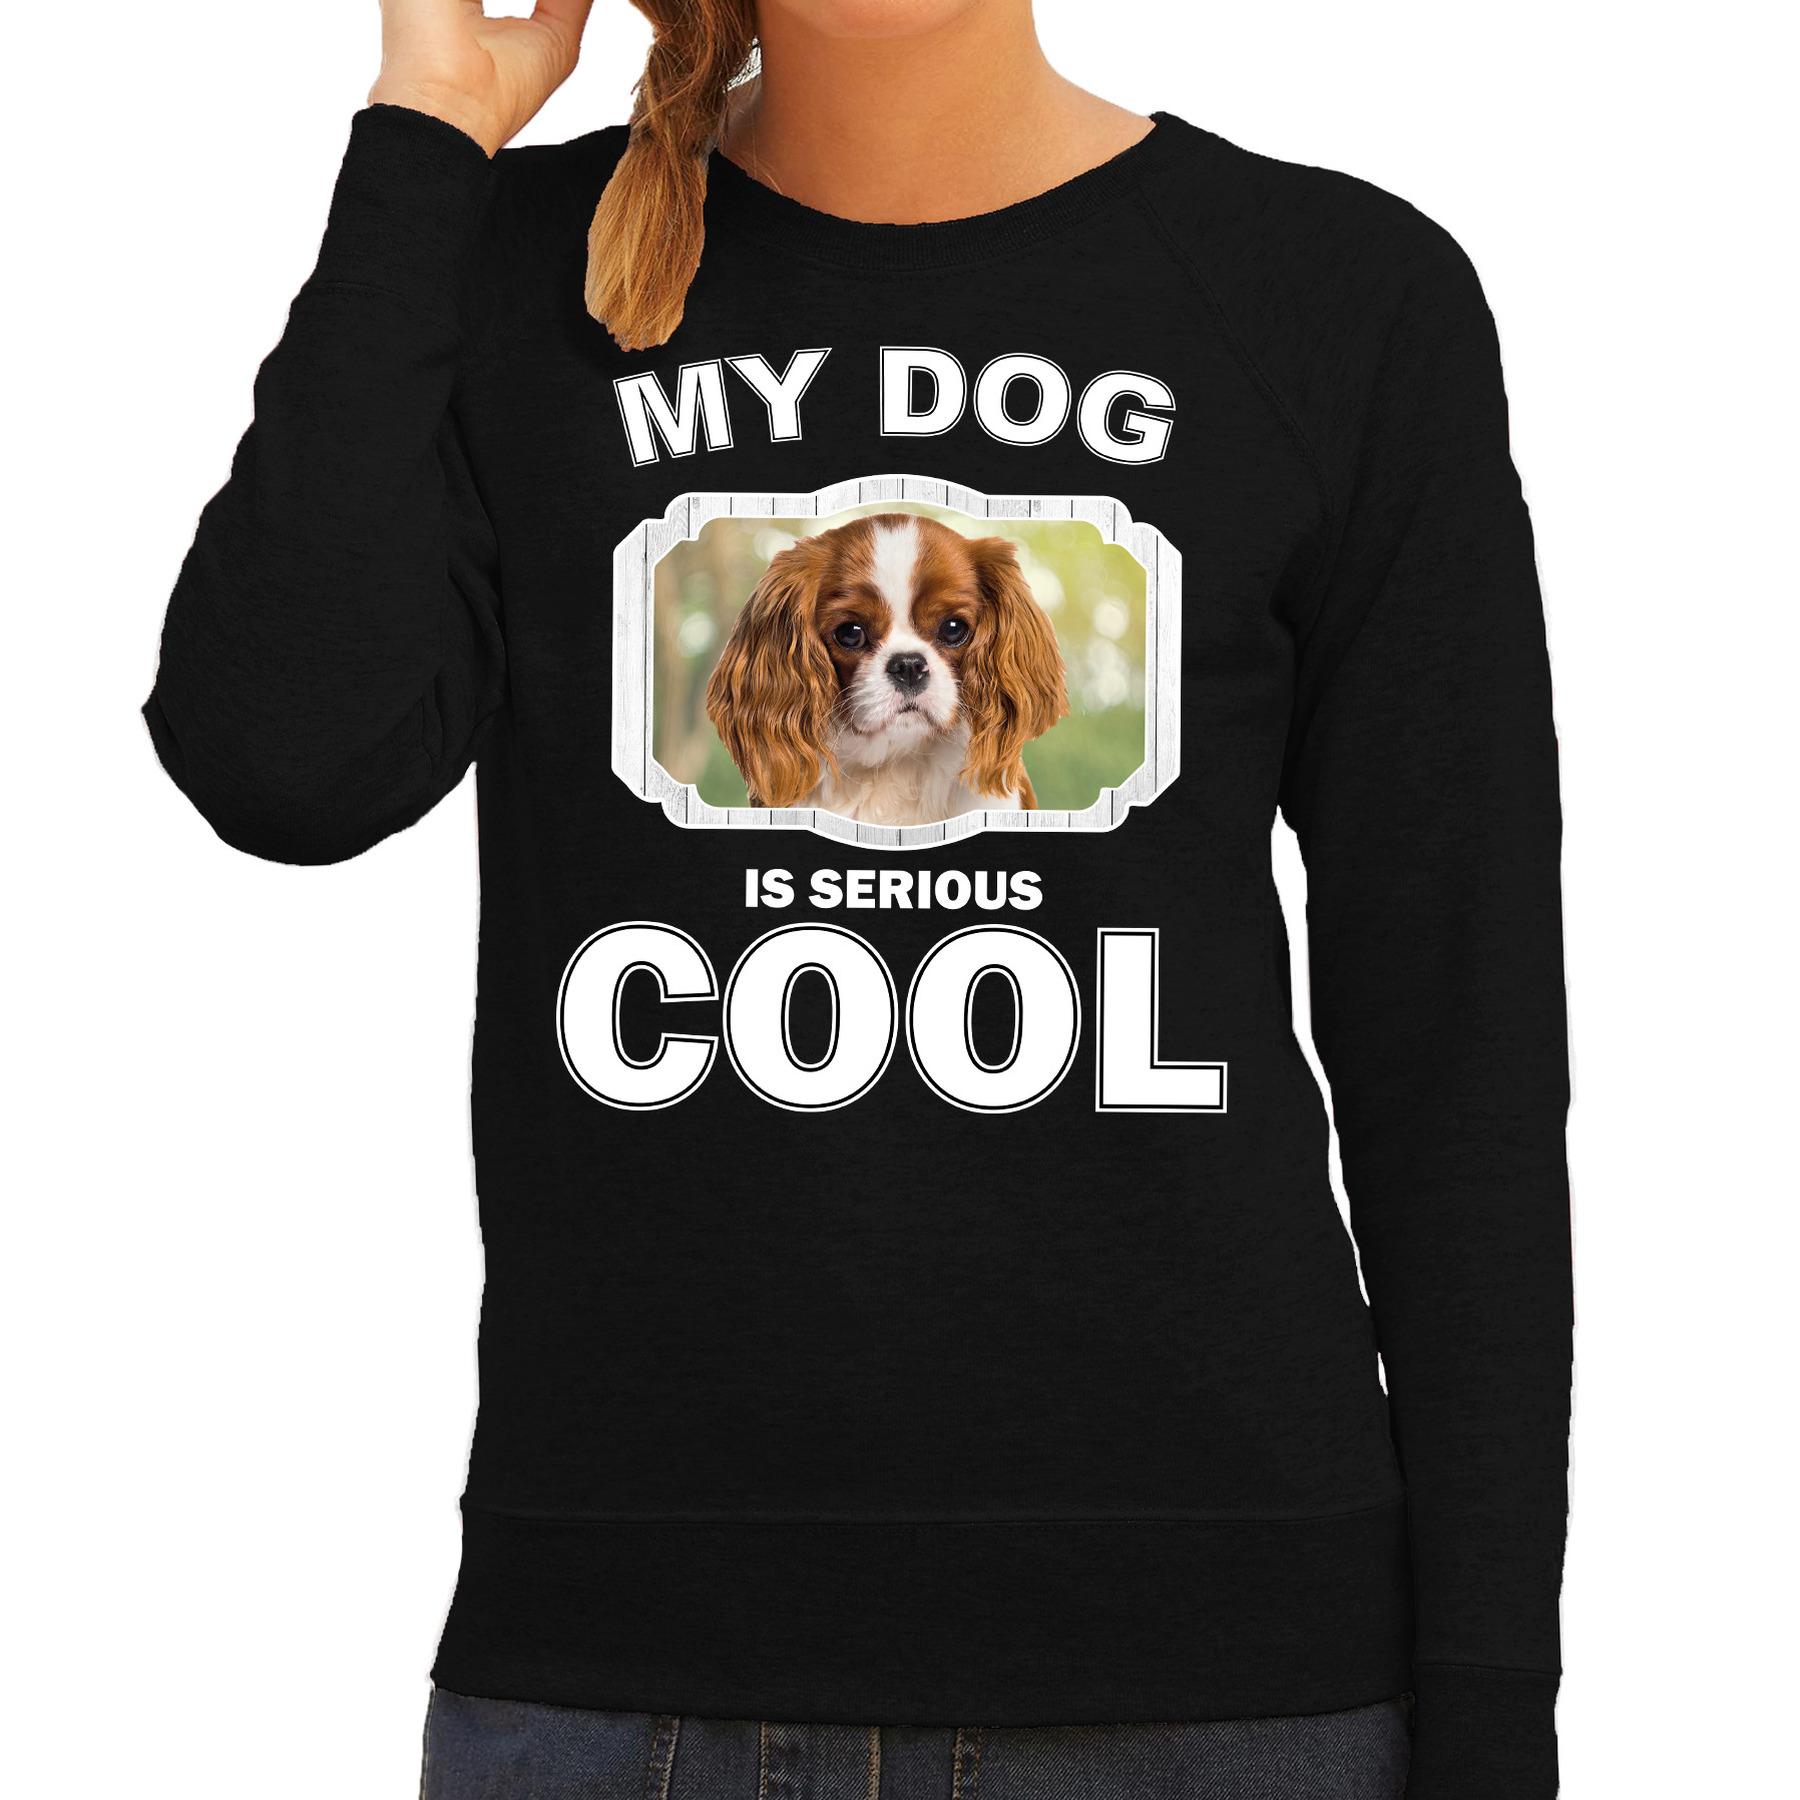 Honden liefhebber trui / sweater Charles spaniel my dog is serious cool zwart voor dames